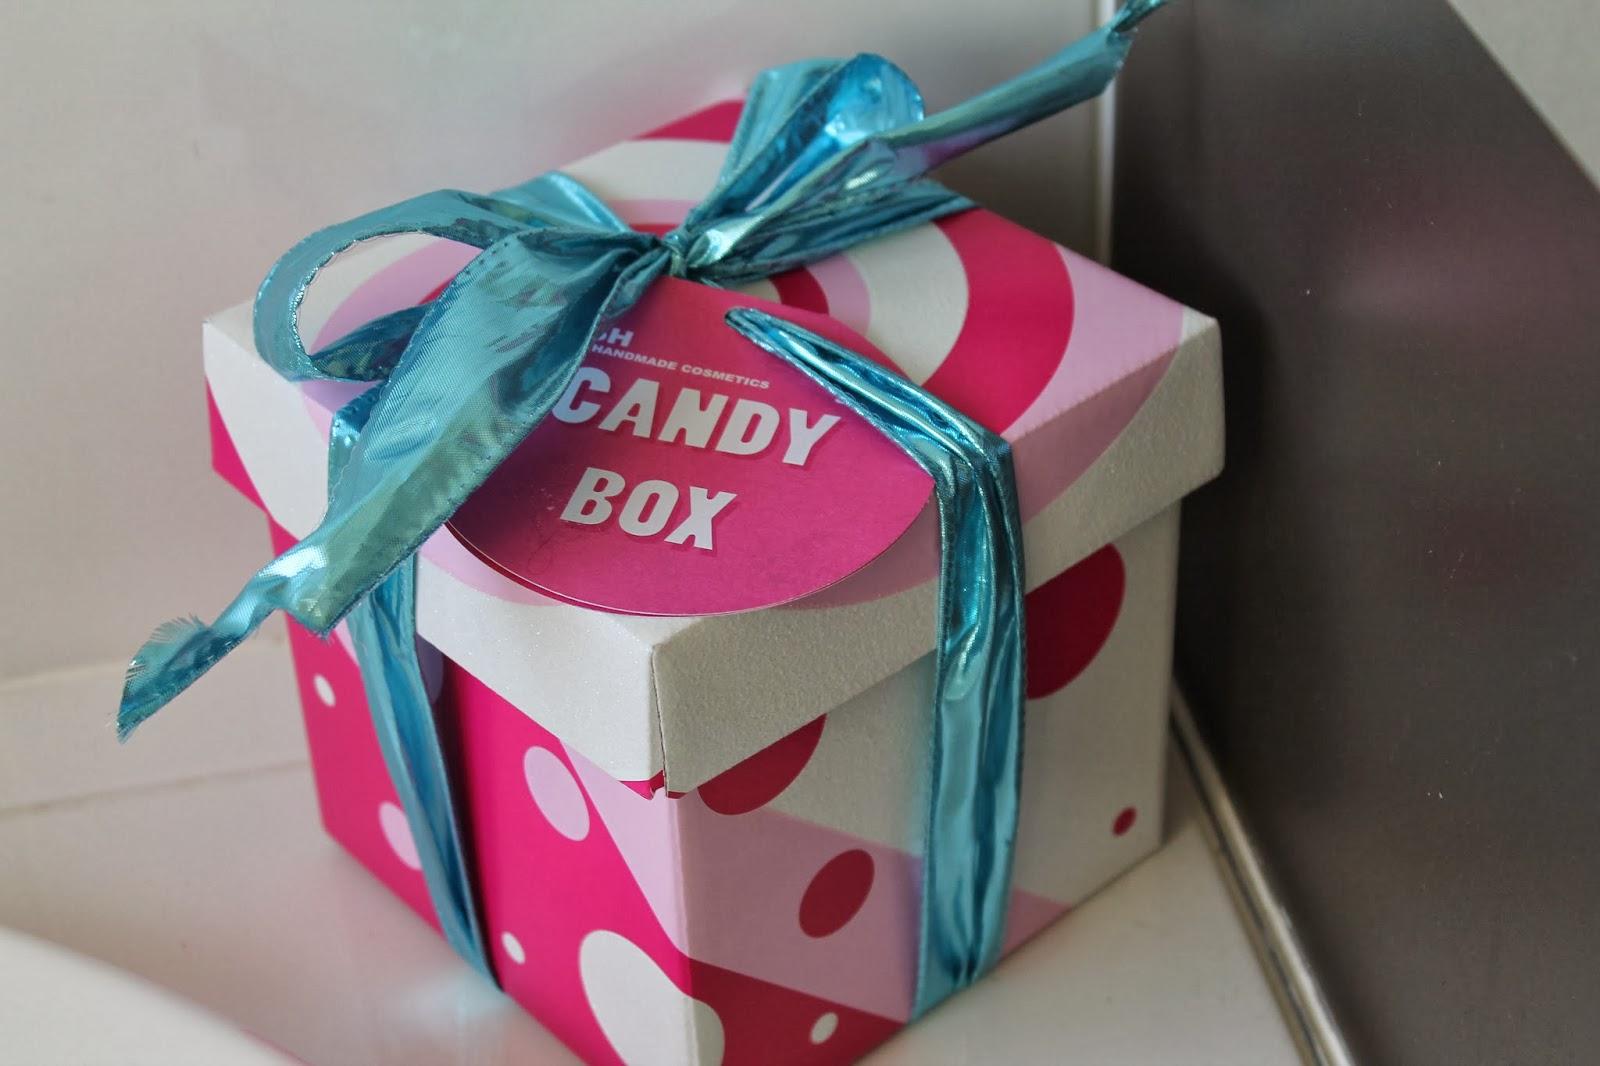 Xobeautyheartxo review lush christmas candy box